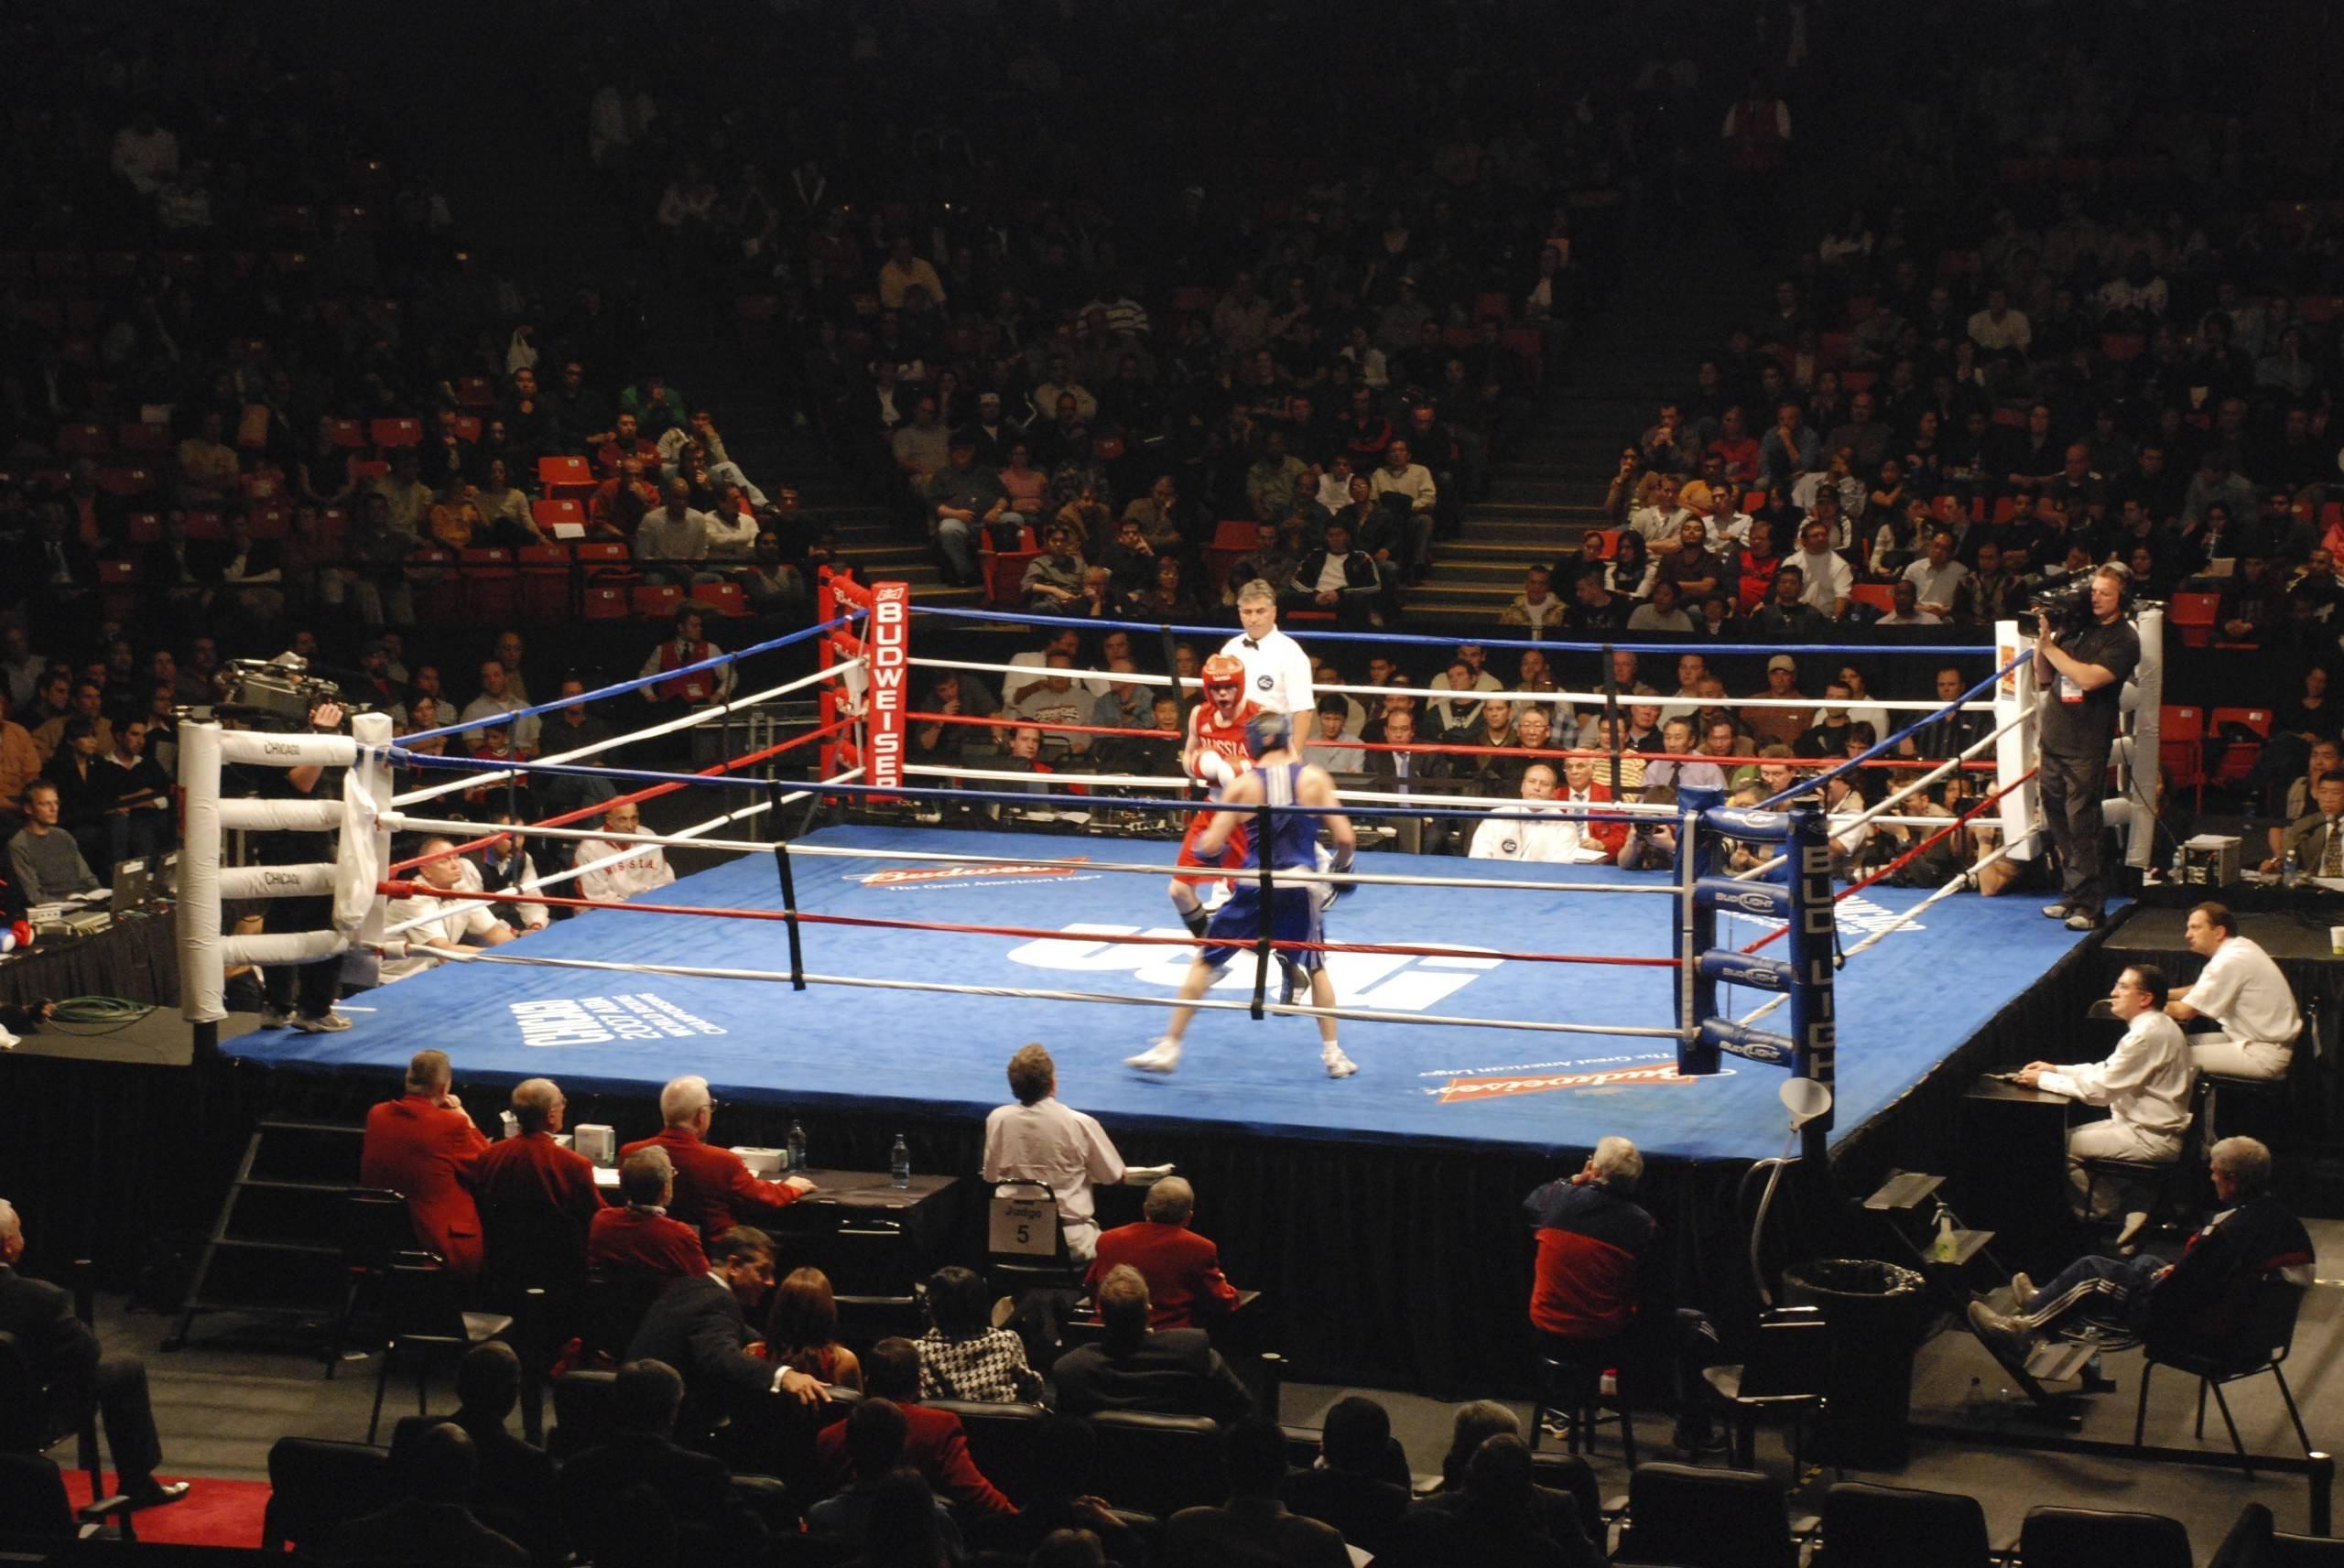 Boxing rings